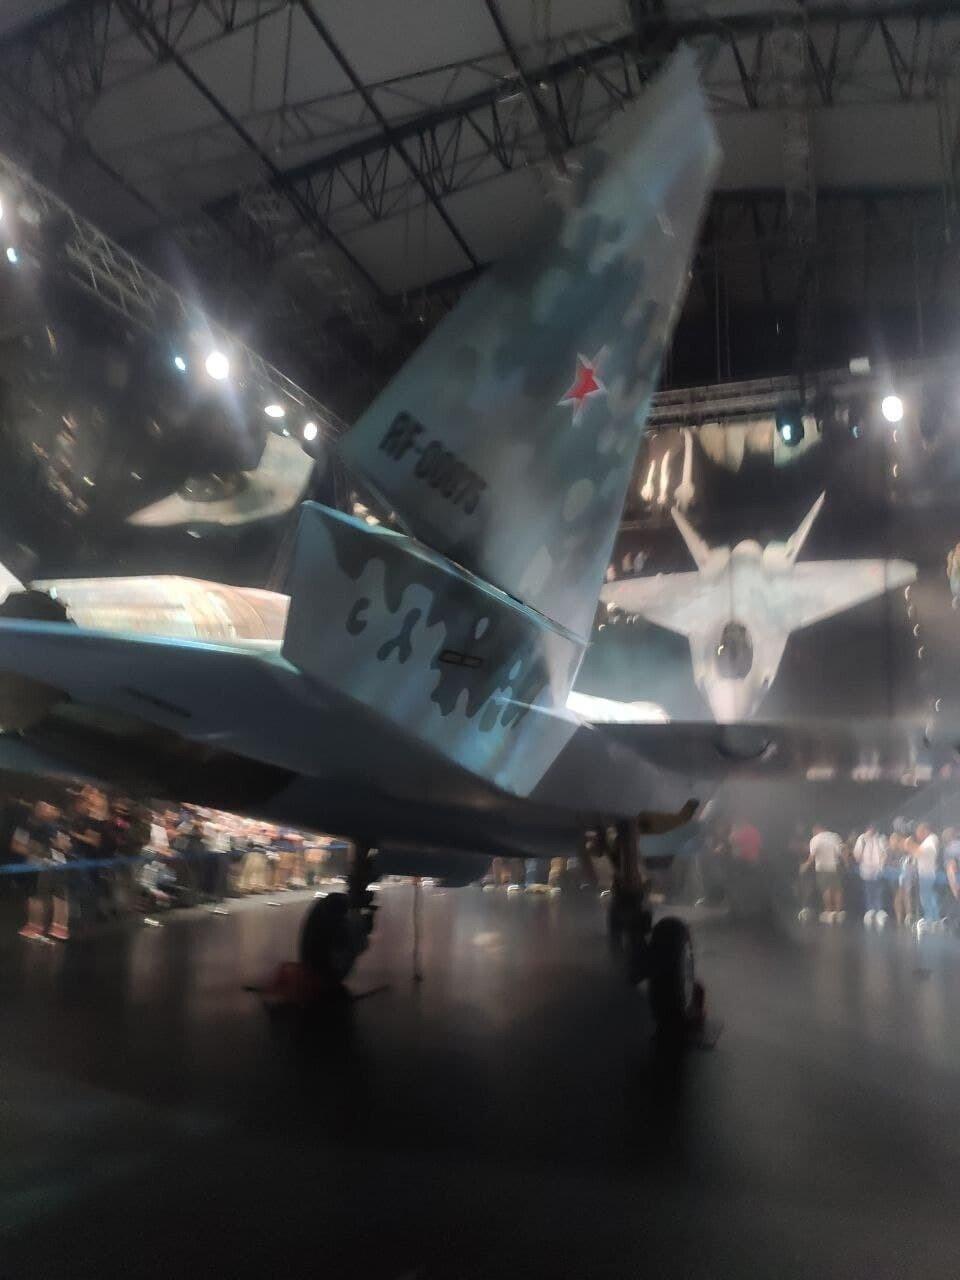 60f6ff3785f5400cc014fcc8.jpg 오늘 공개된 러시아의 신형 스텔스 전투기